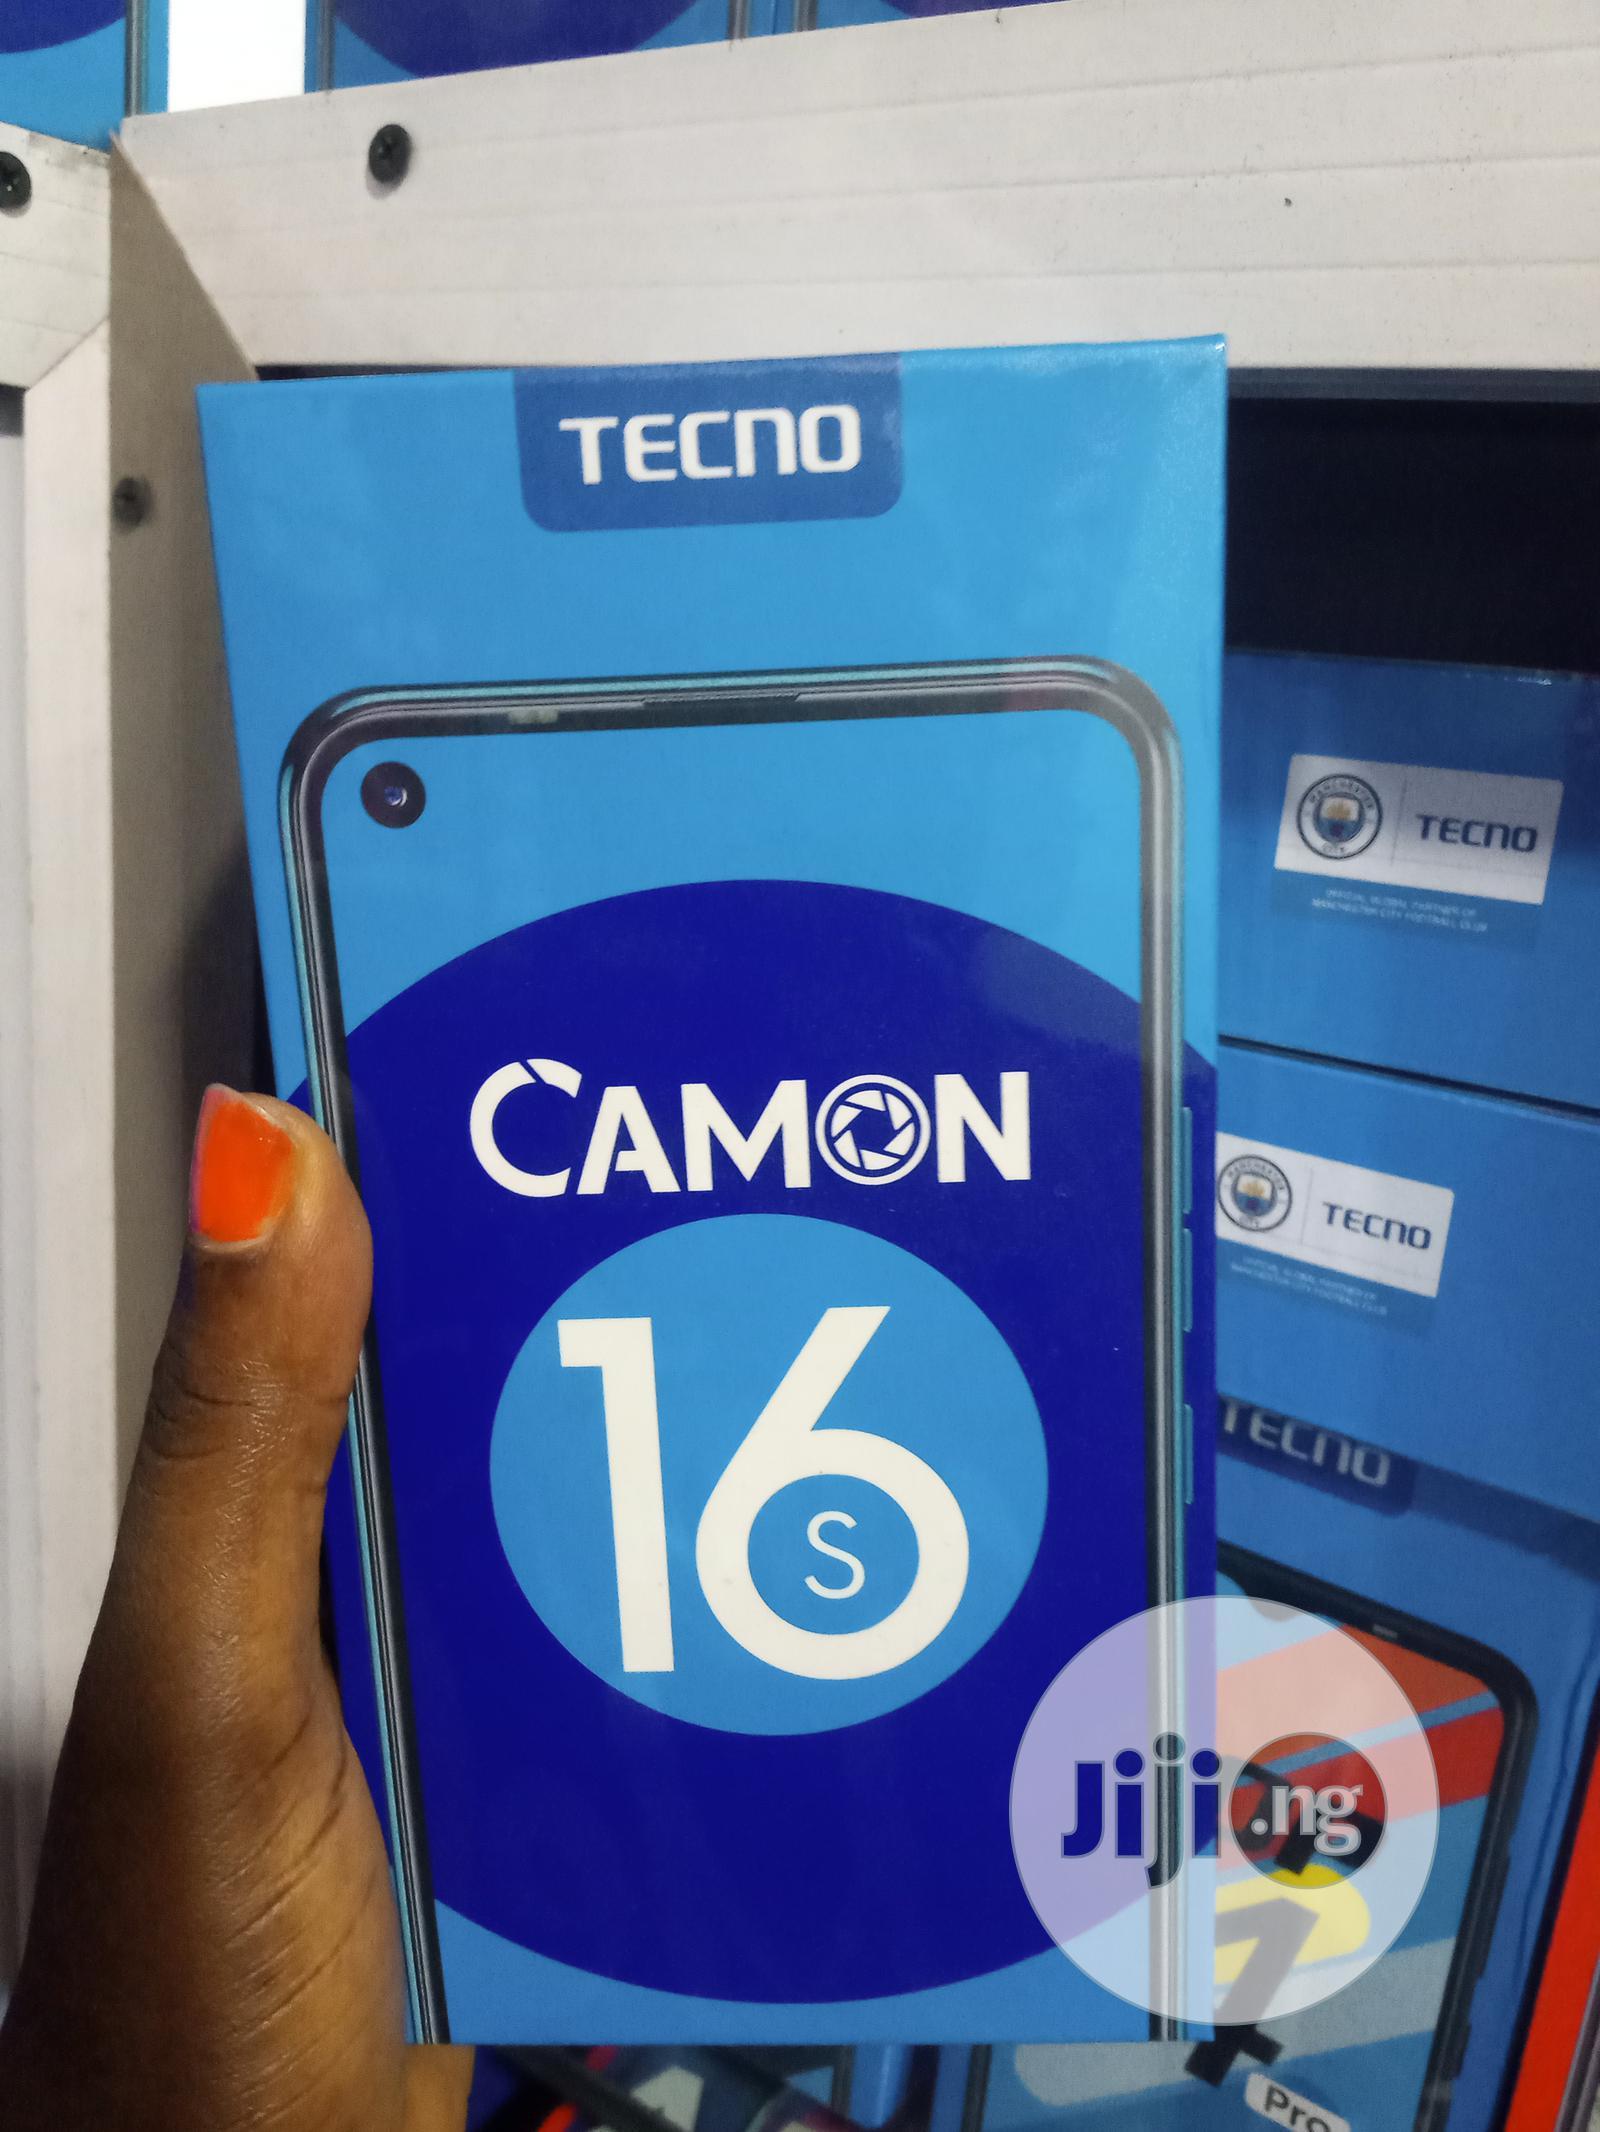 New Tecno Camon 16S 128 GB